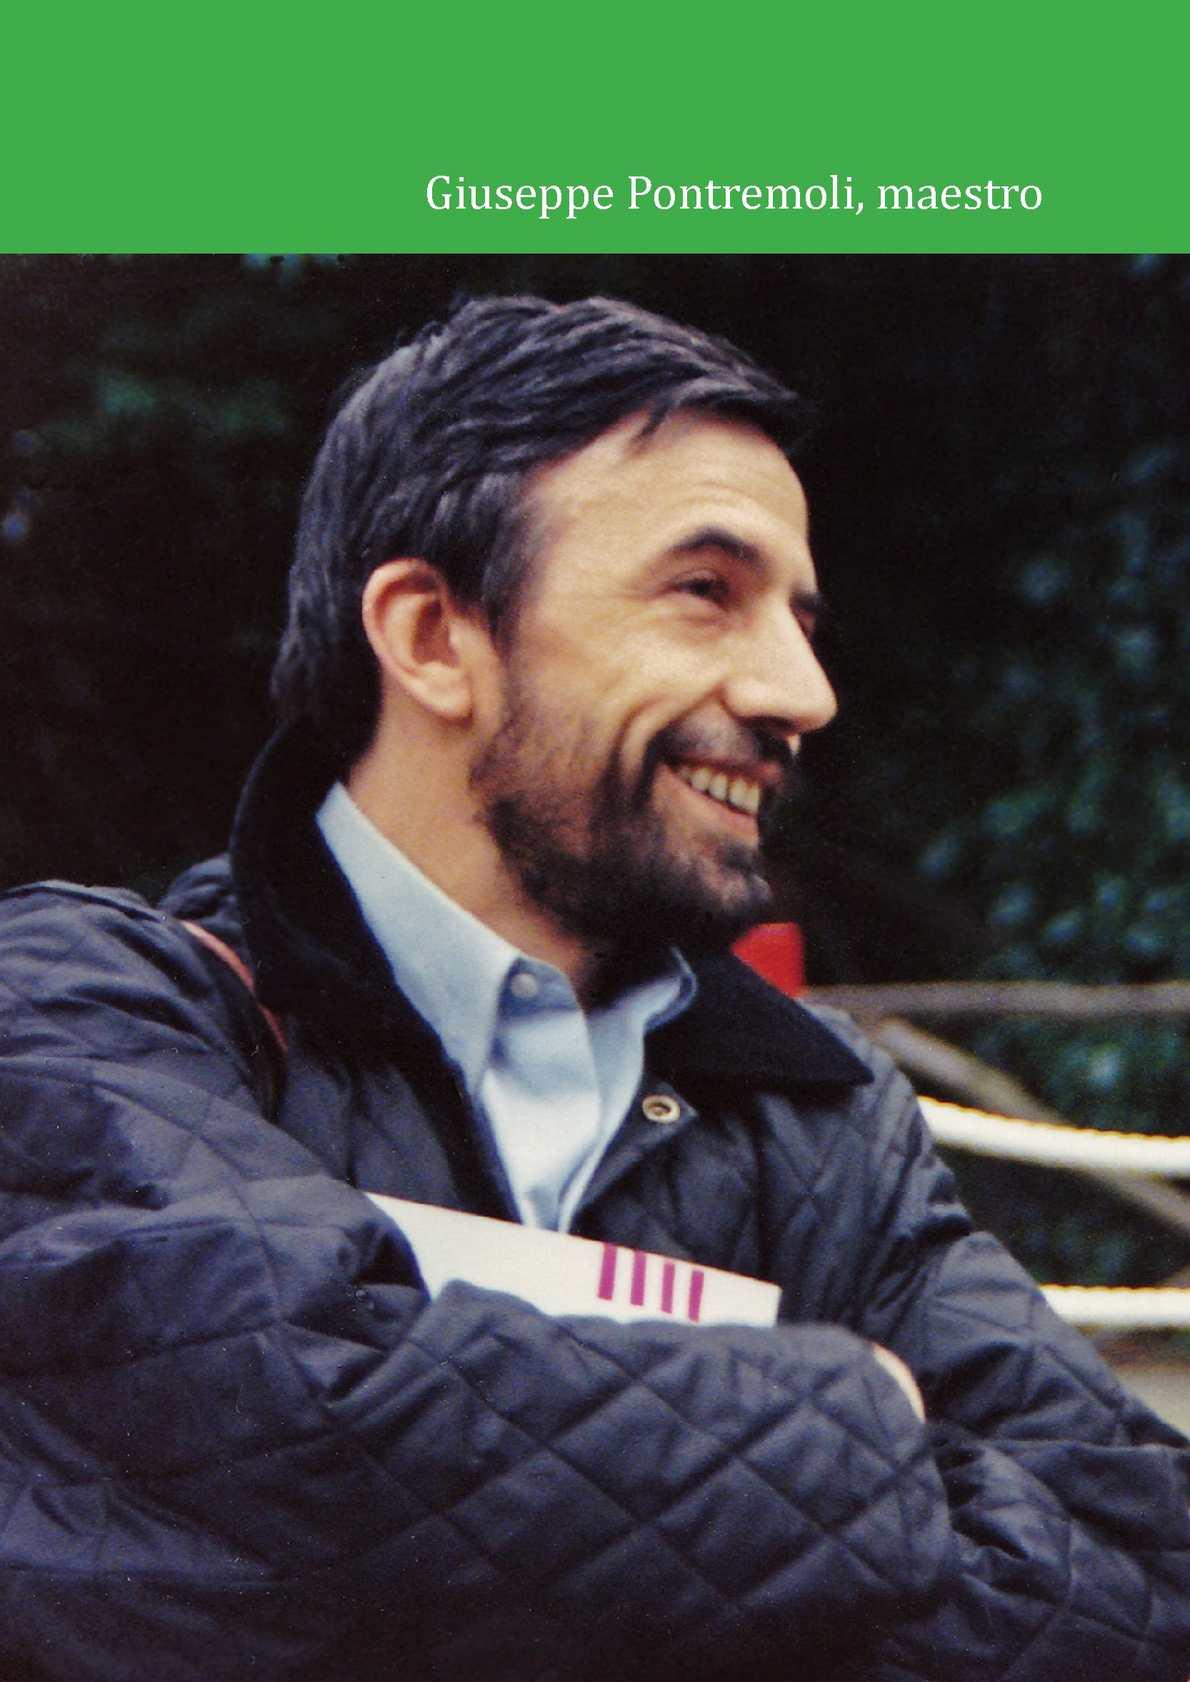 Giuseppe Pontremoli, maestro